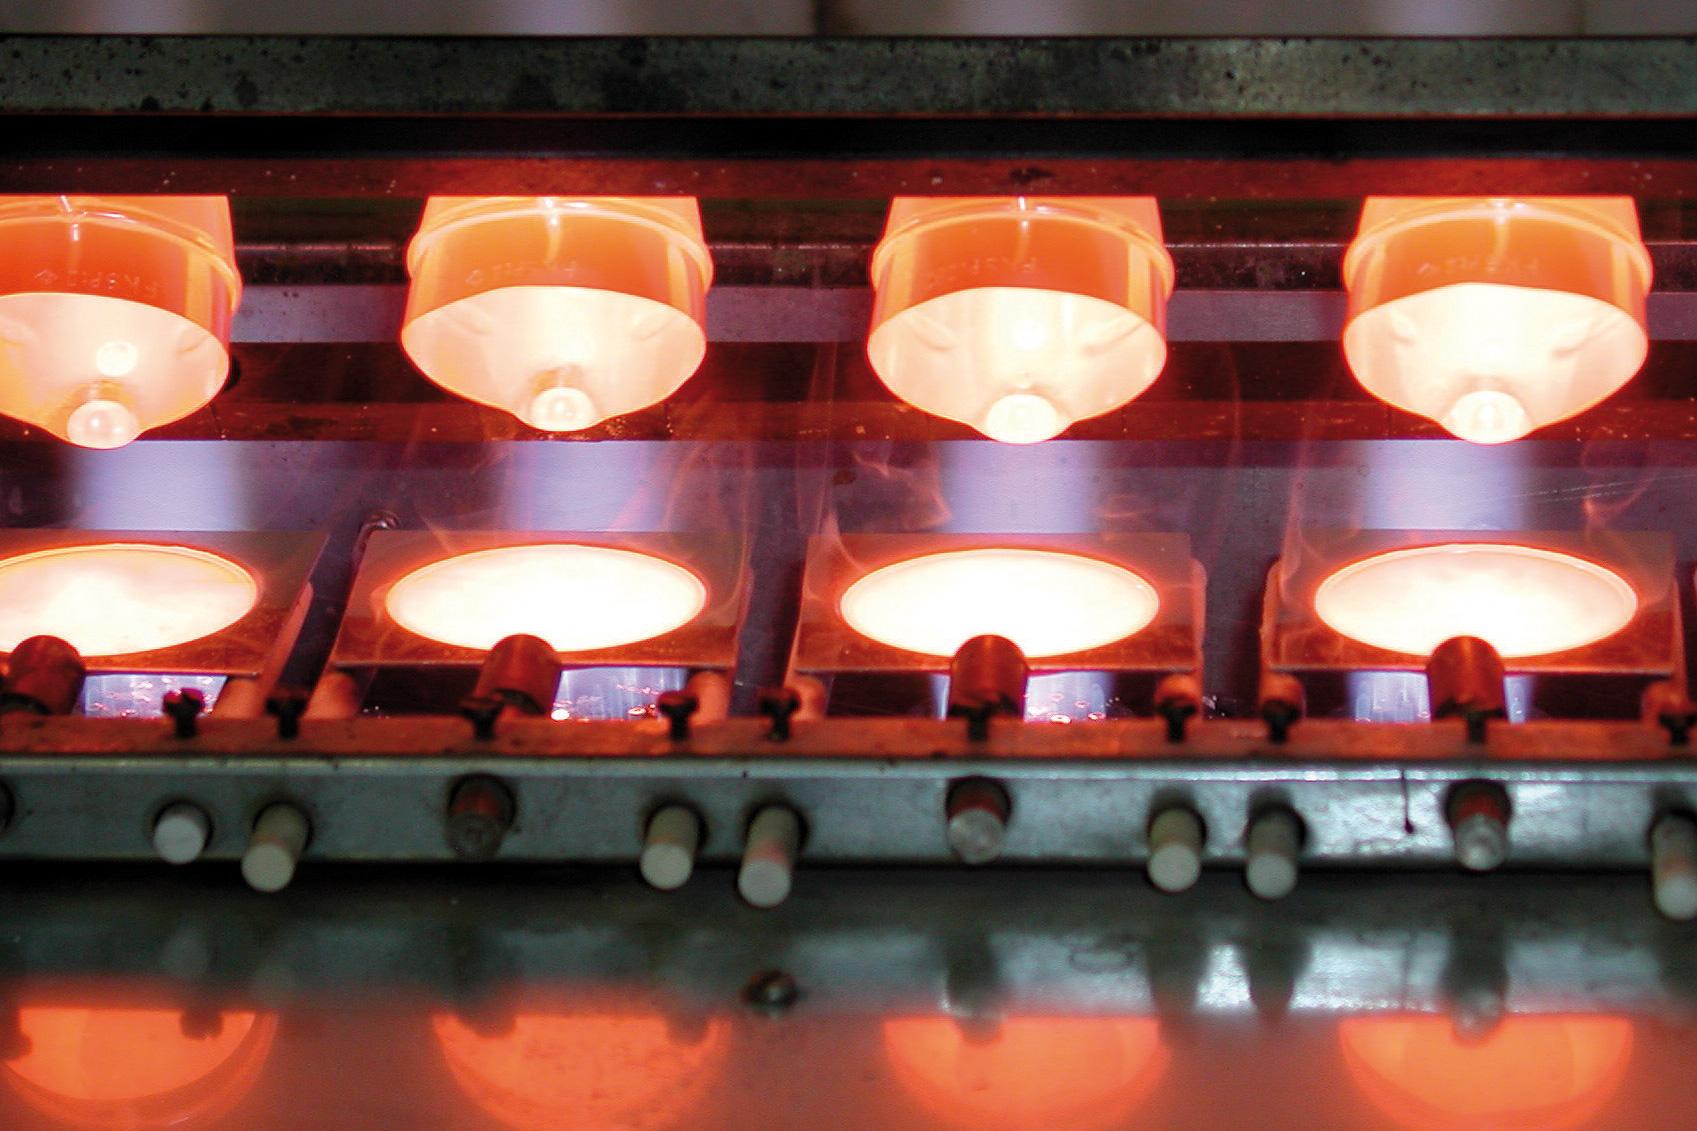 Platingeräte im Aufschmelzautomat